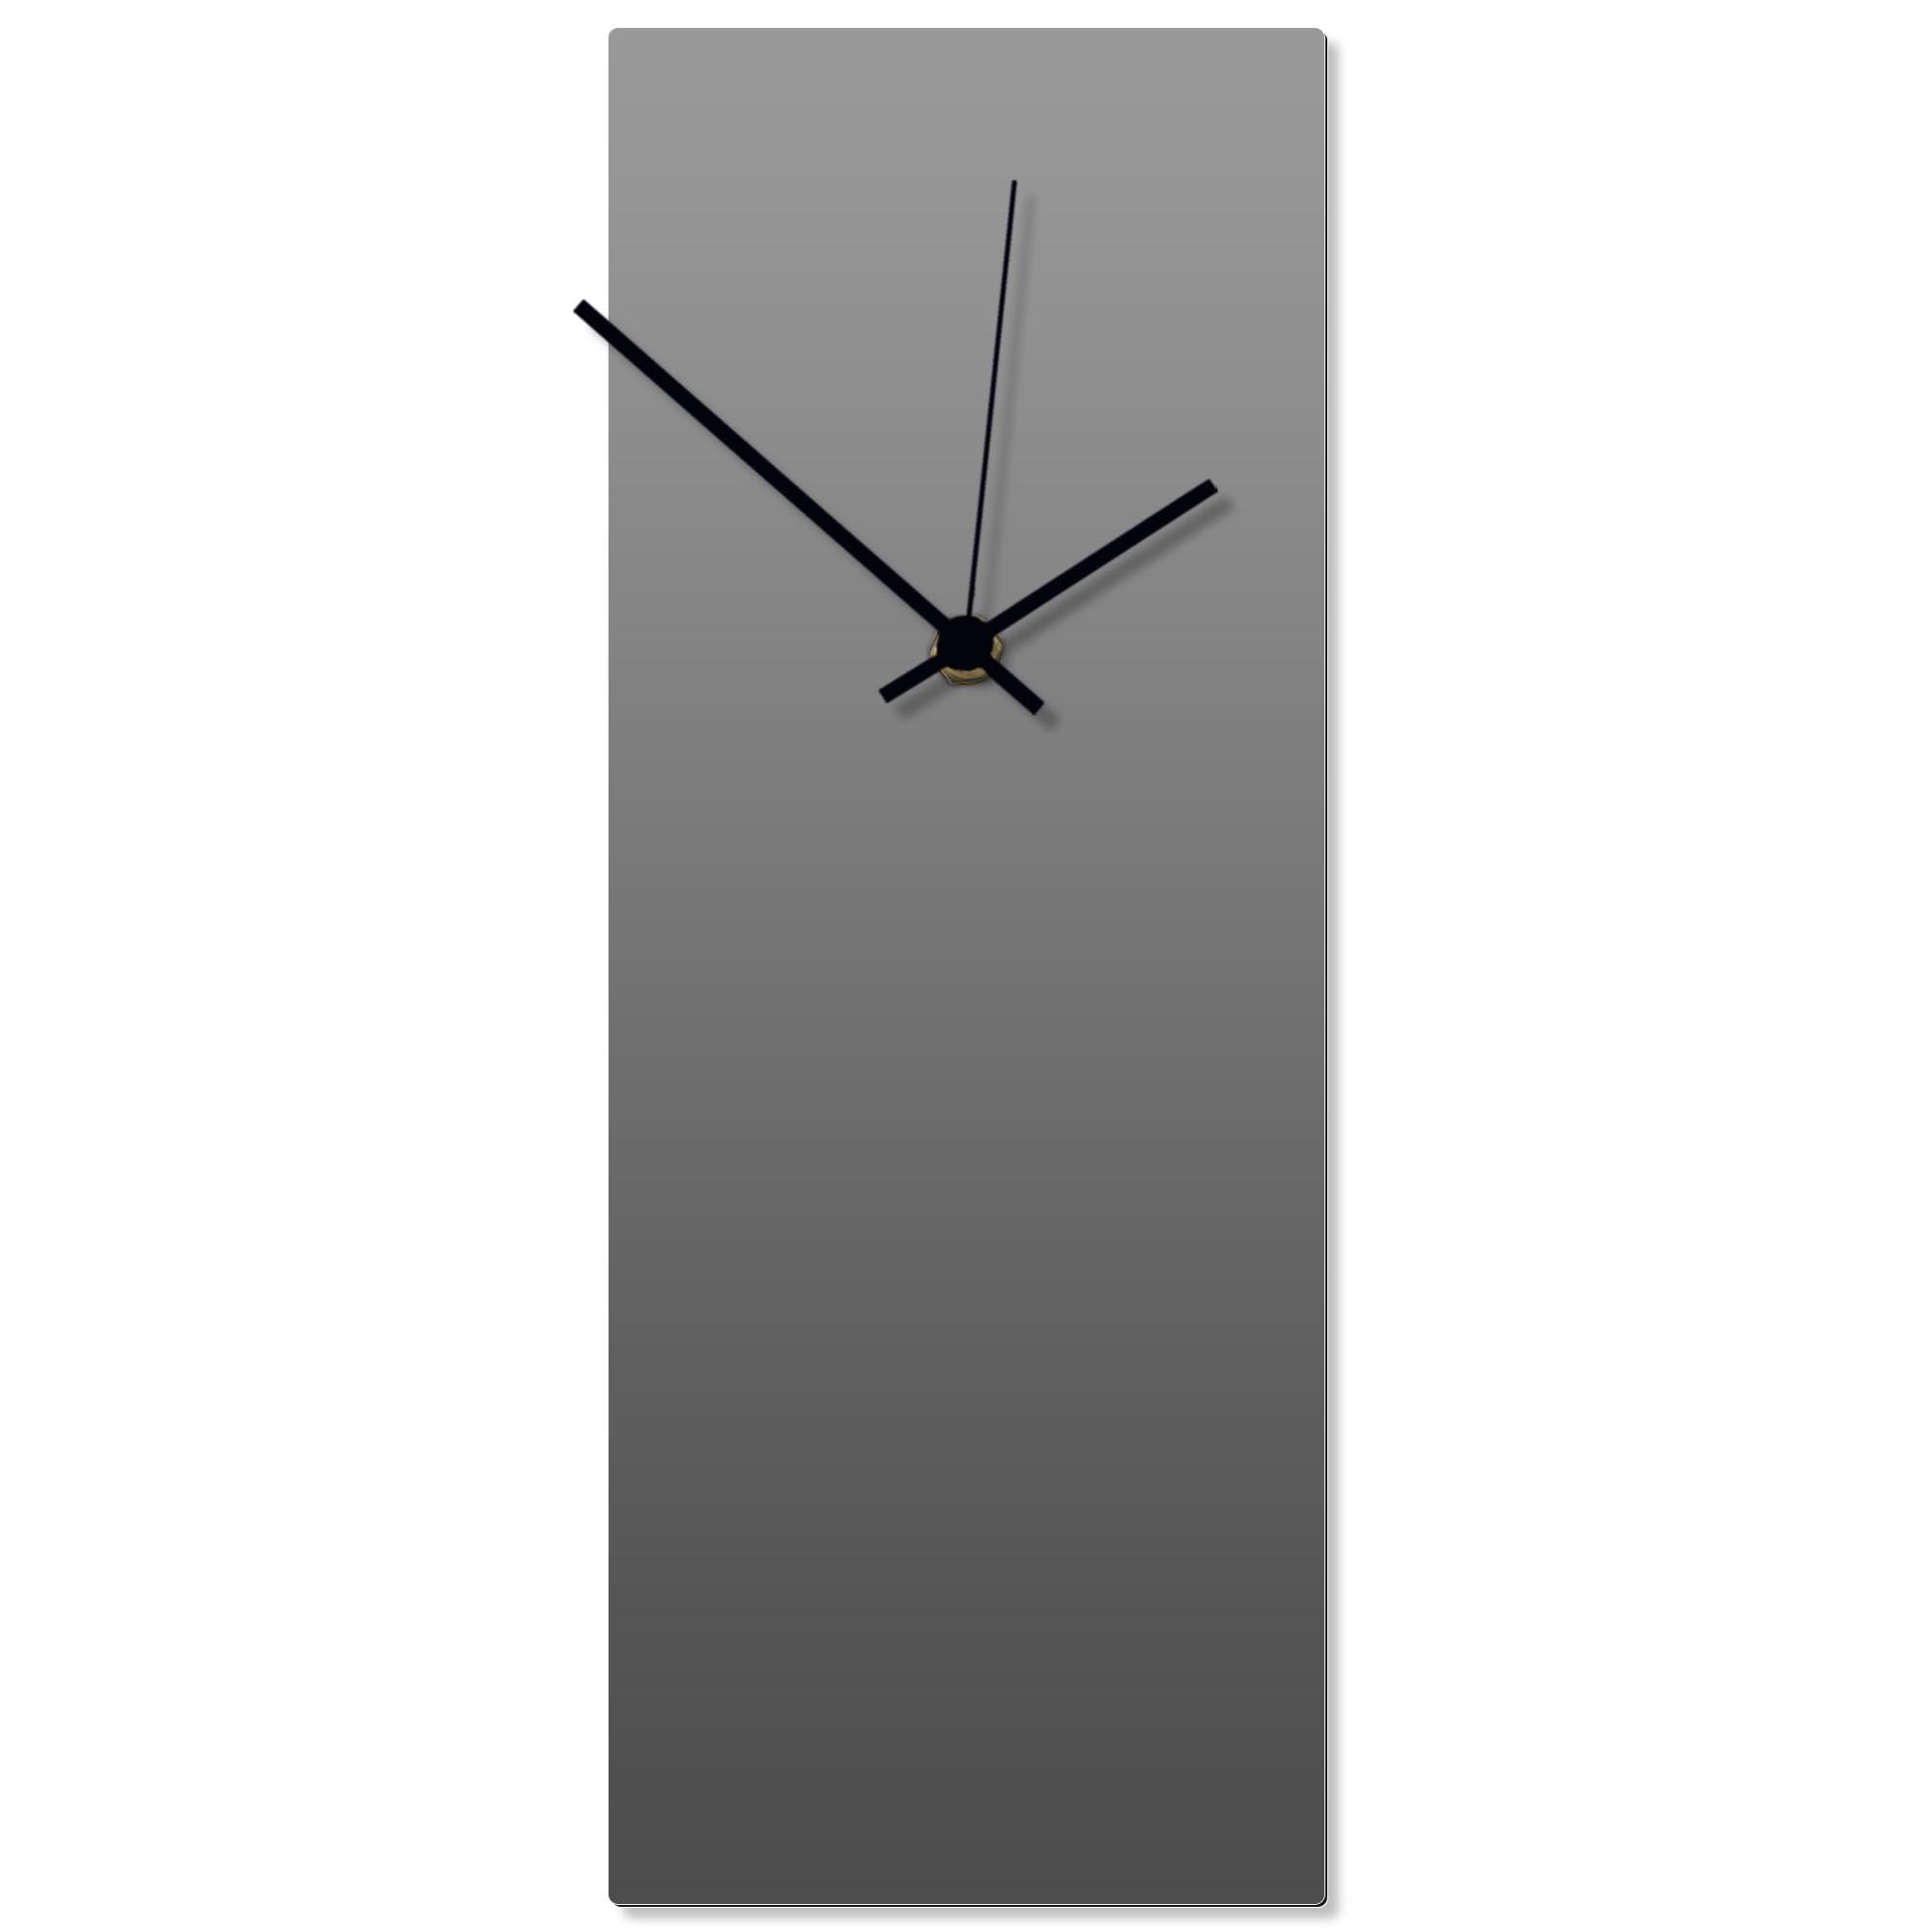 Grayout Black Clock 6x16in. Aluminum Polymetal